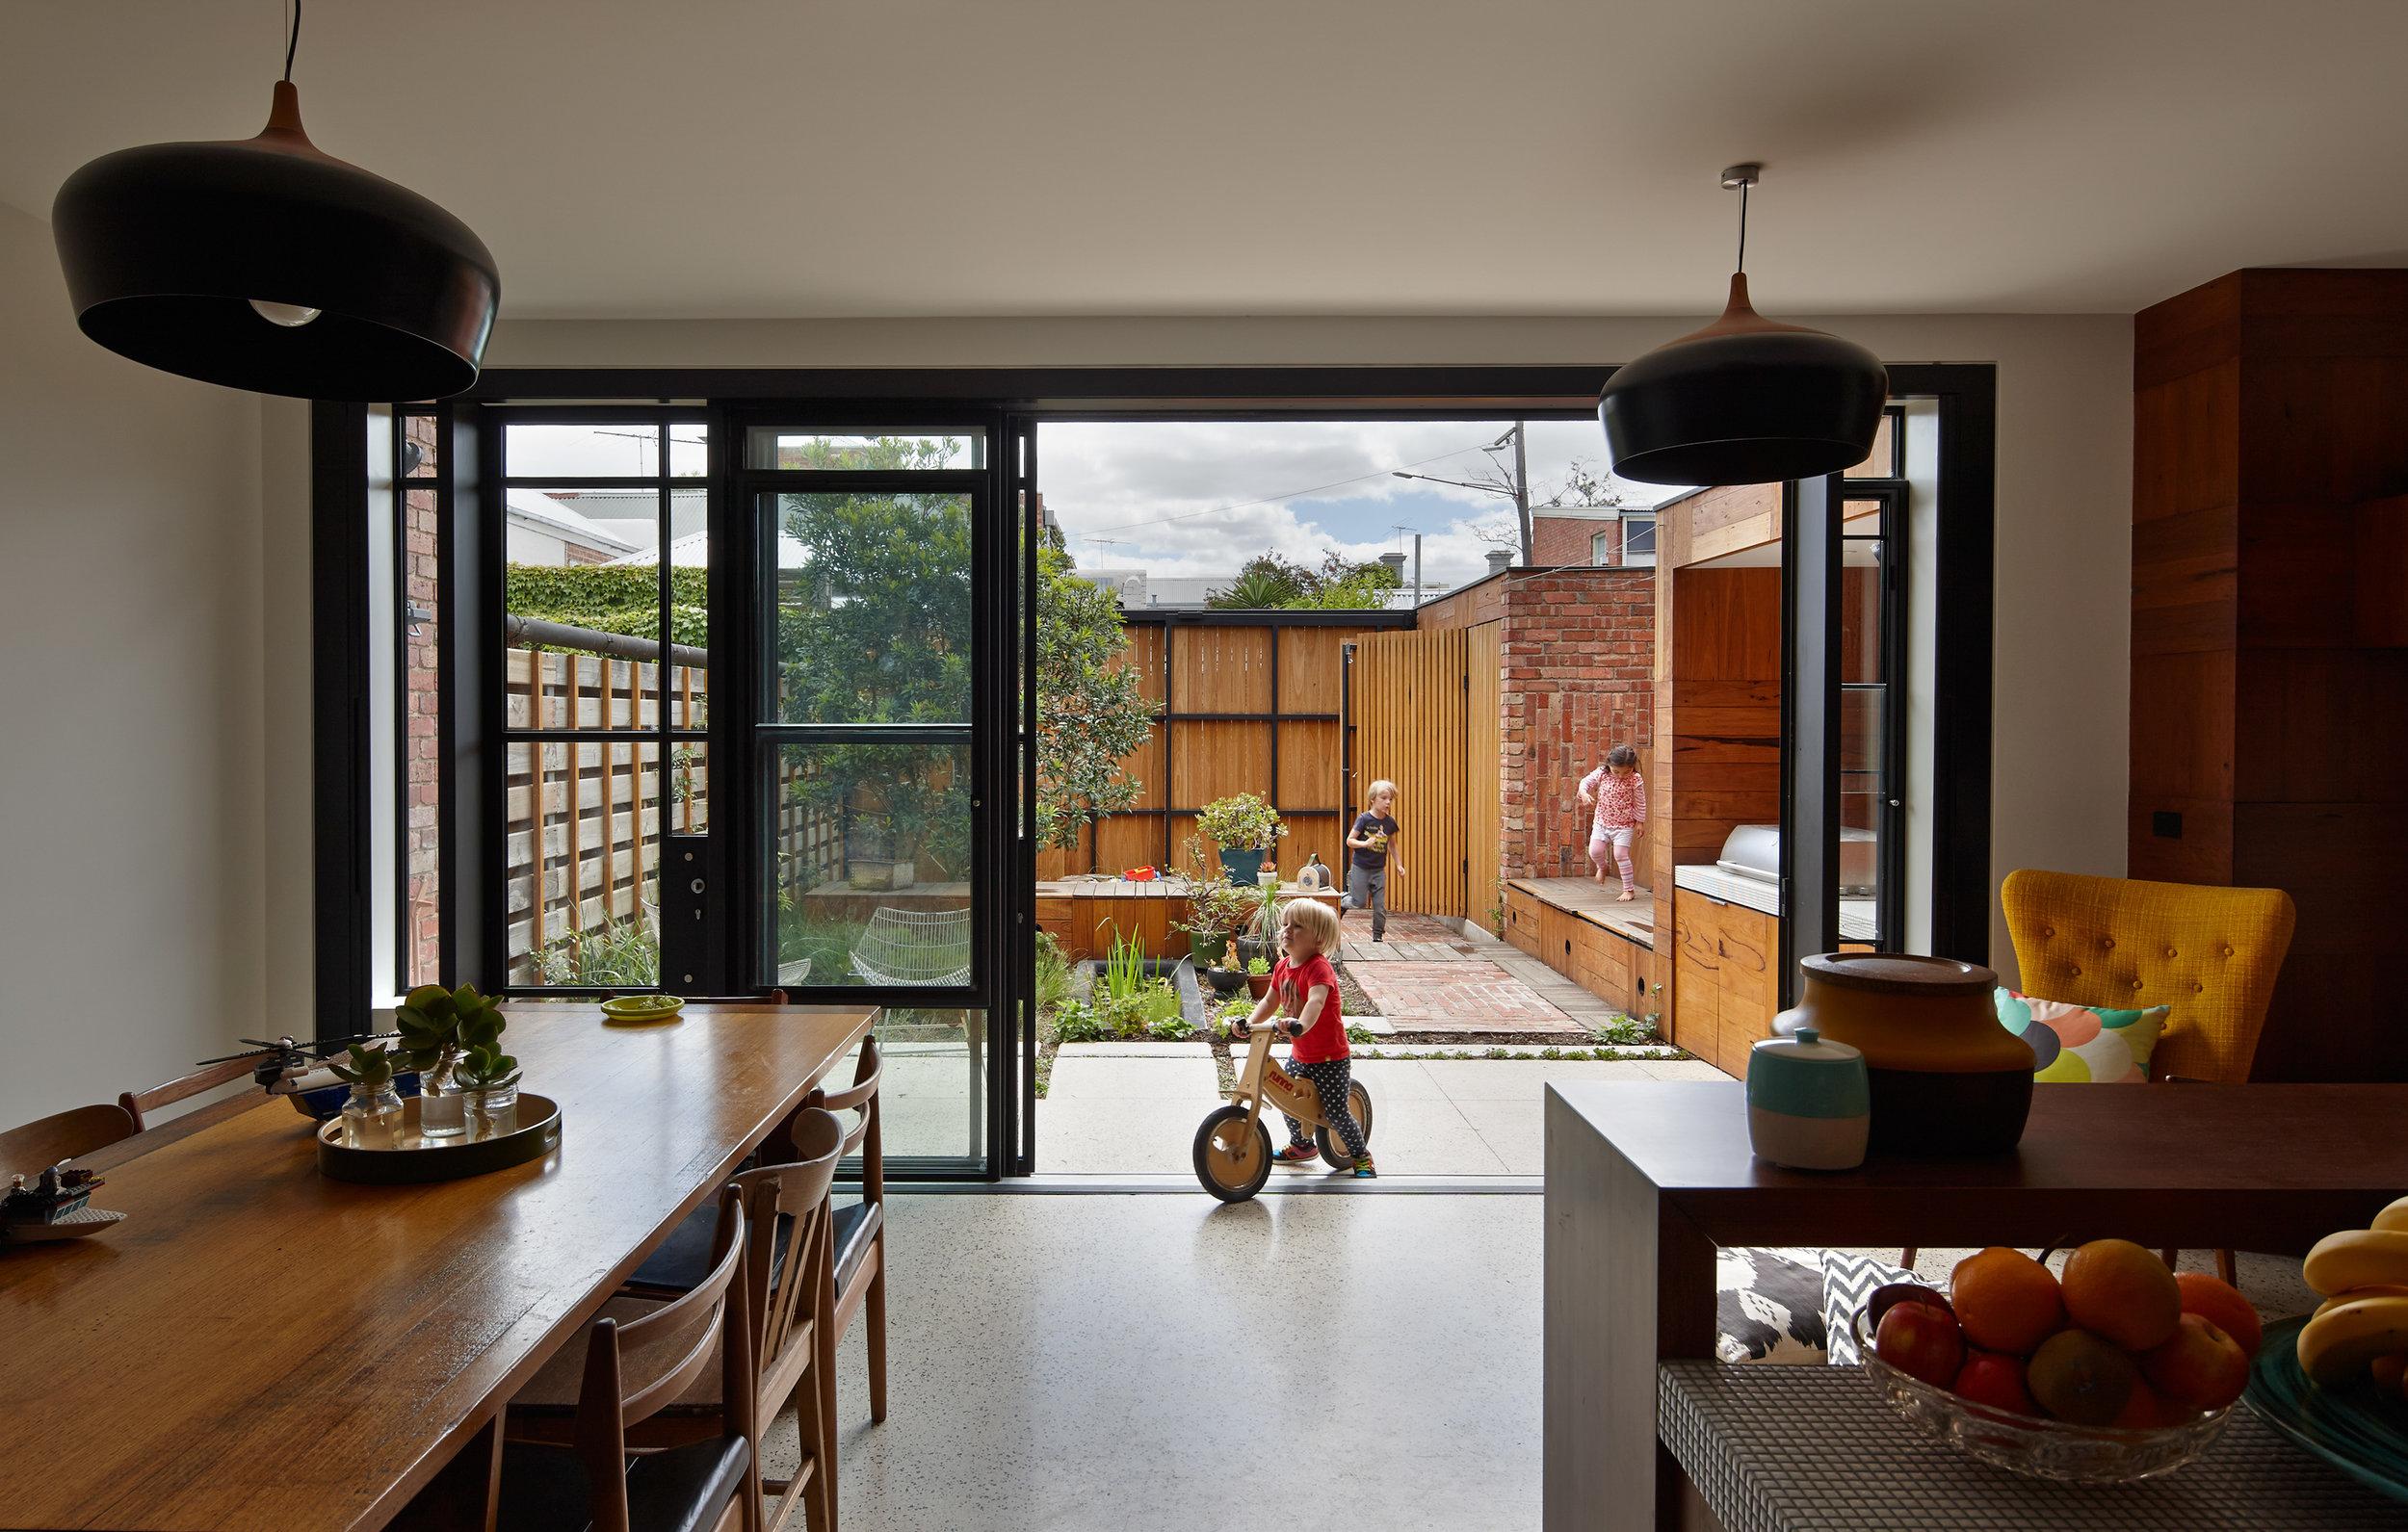 cubo-house-phooey-architects-the-design-emotive-16.jpg